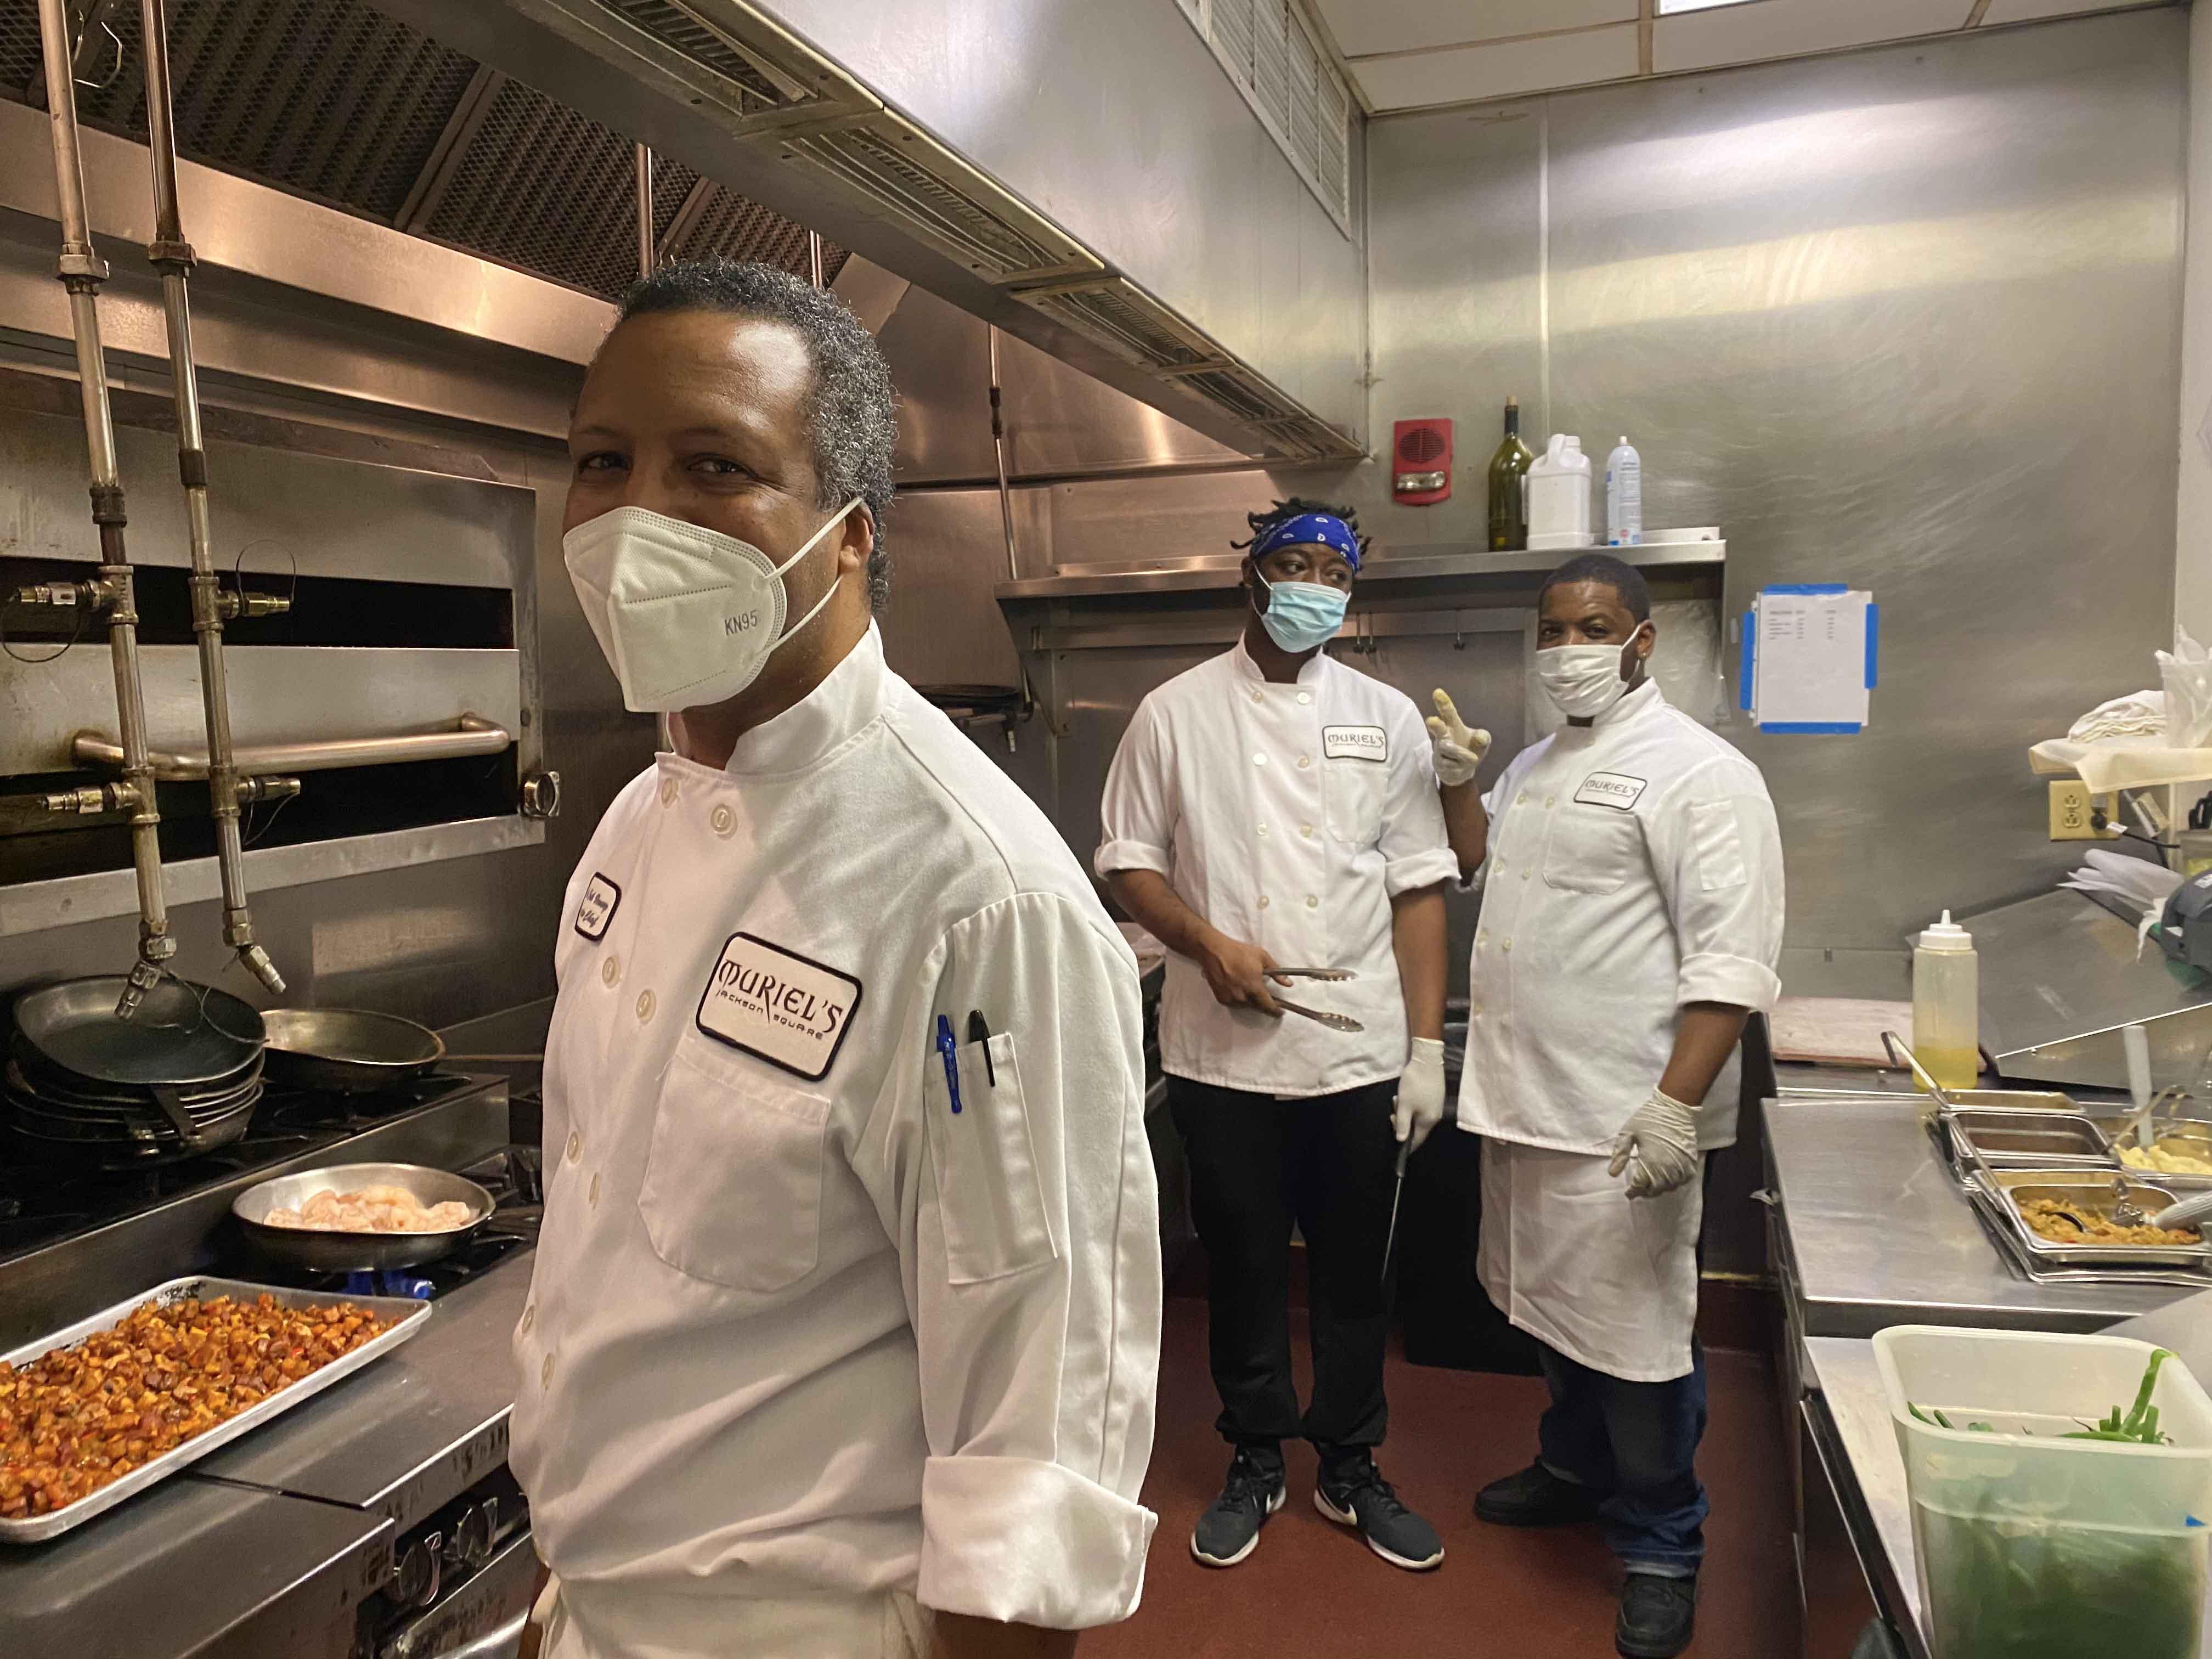 Masked Cooks in Kitchen